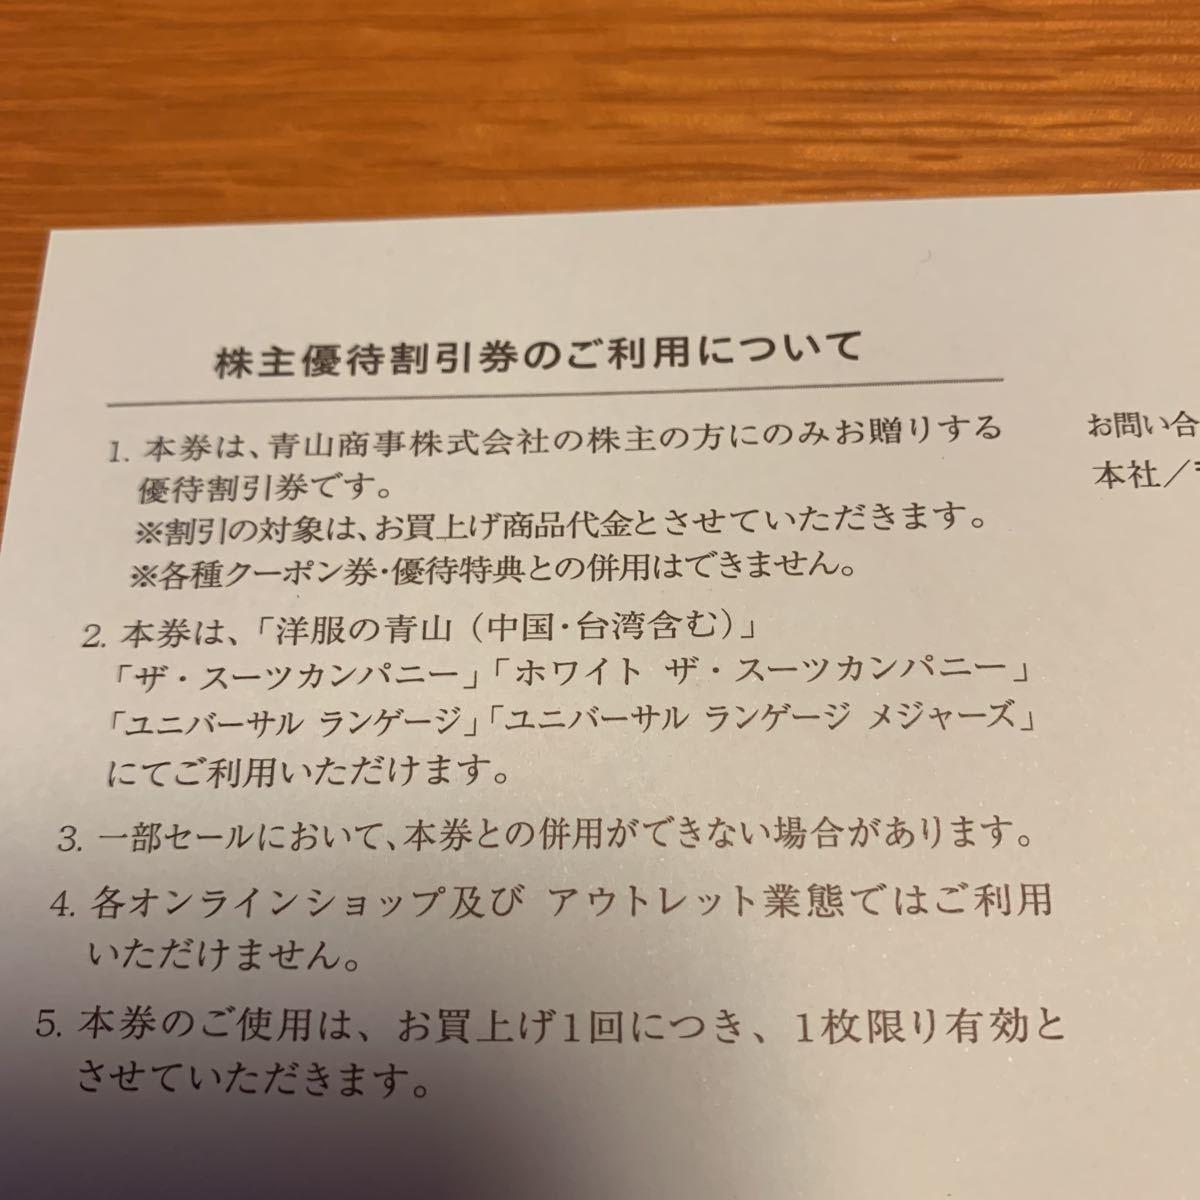 青山商事 株主優待 割引券20%off洋服の青山 3枚_画像3